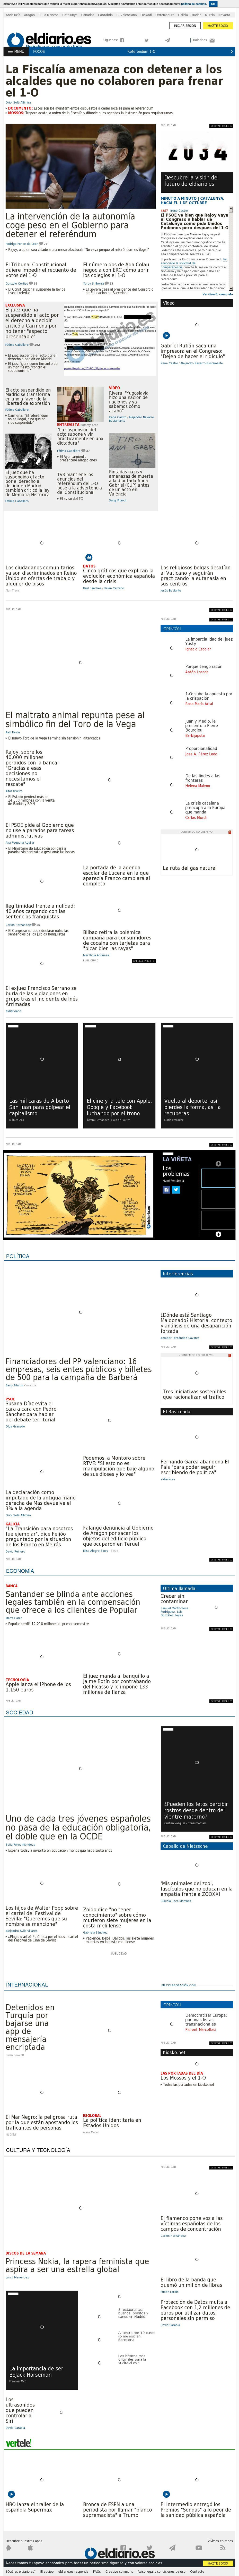 El Diario at Wednesday Sept. 13, 2017, 12:03 p.m. UTC